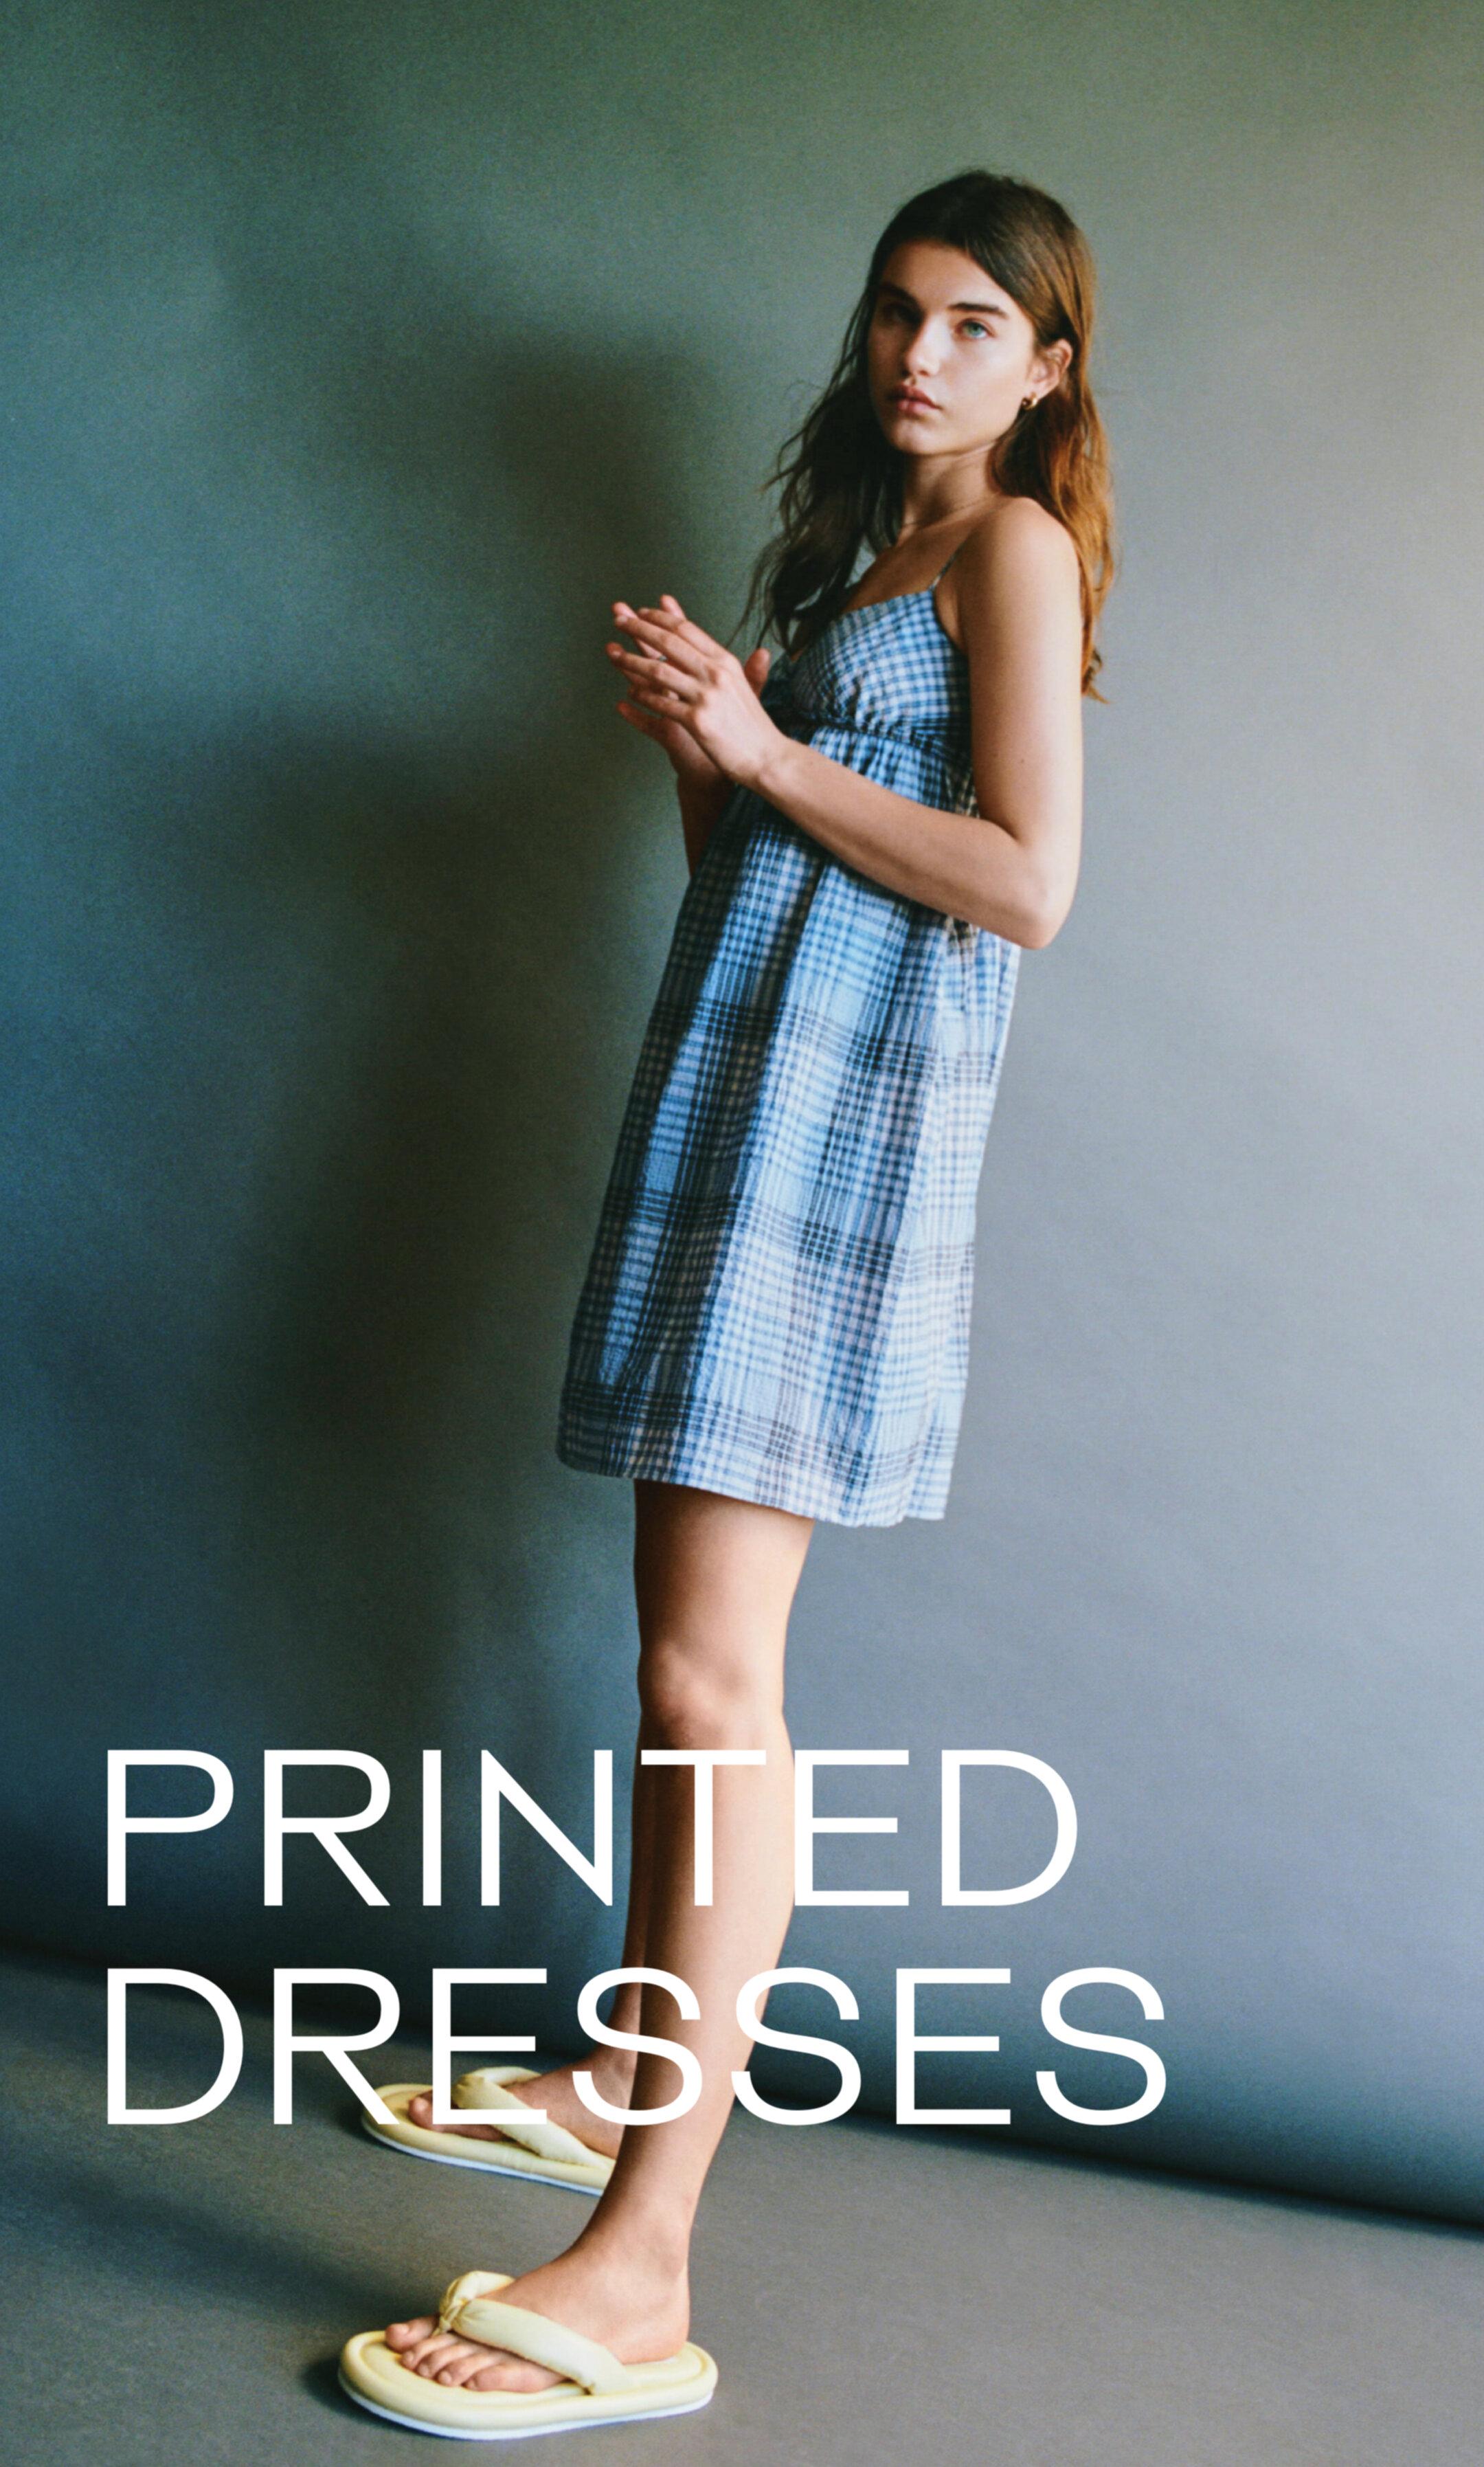 Printed Dresses Story 1